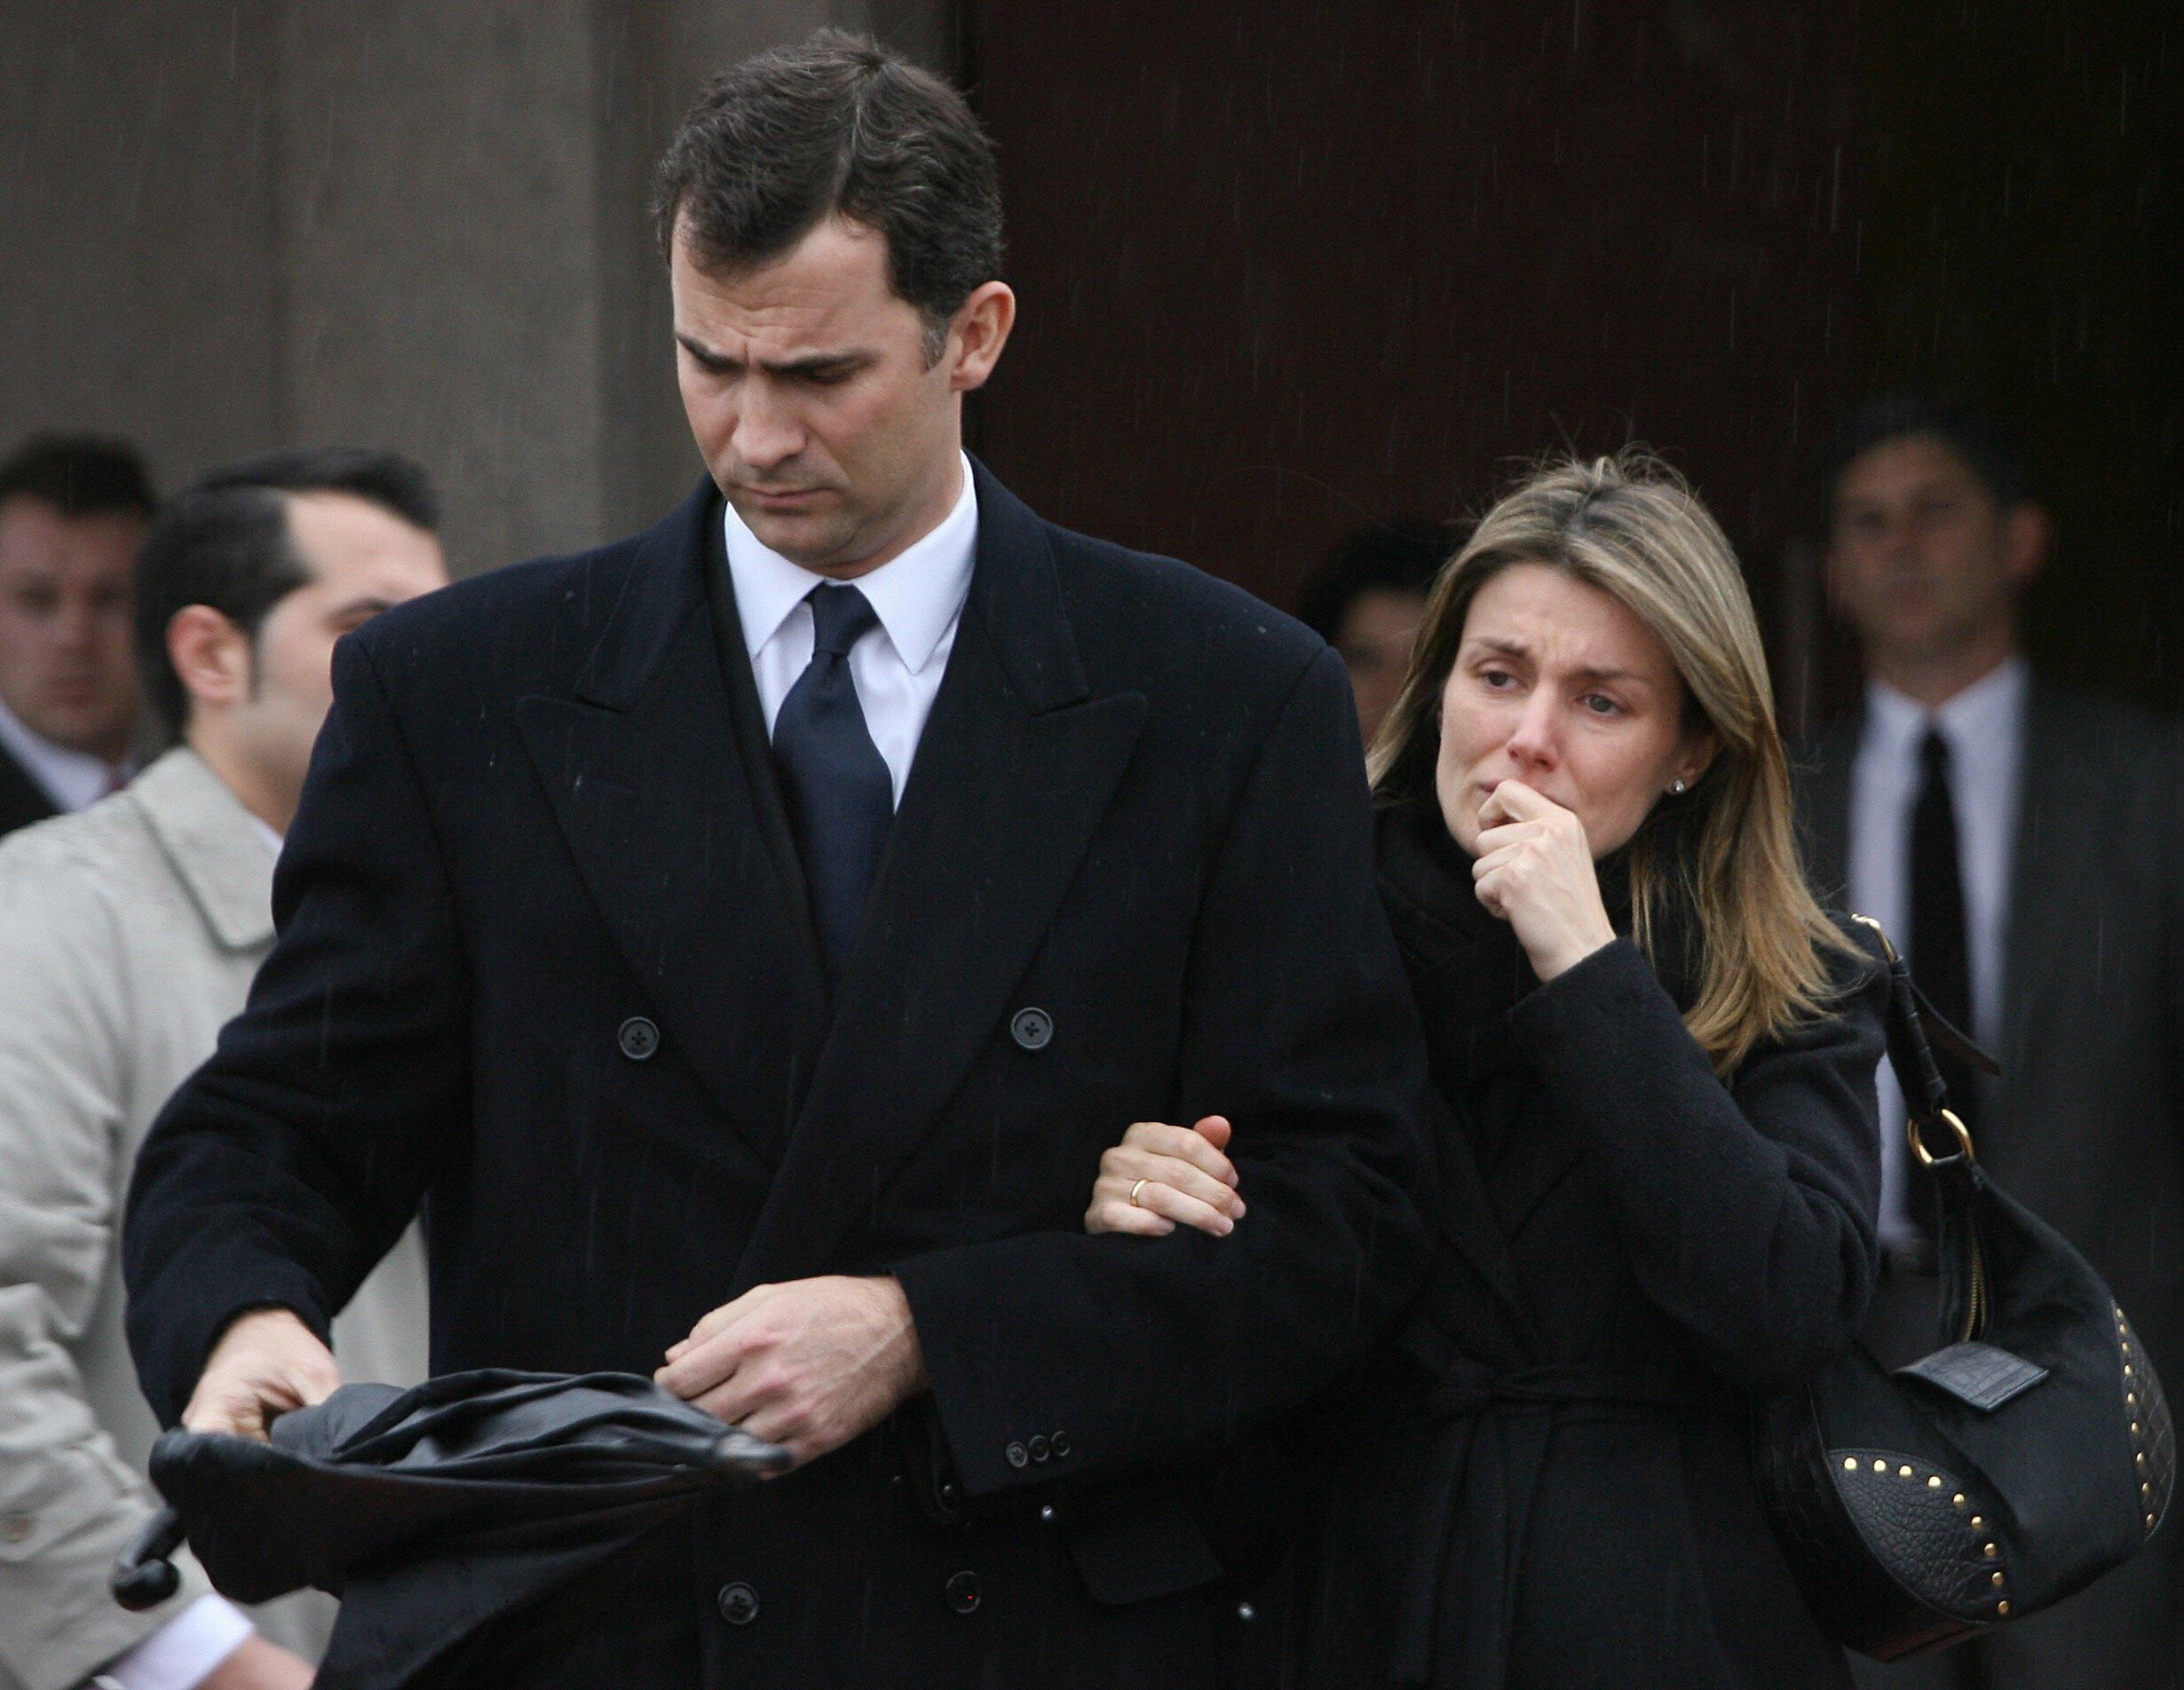 Spain's Princess Letizia (R) leaves with